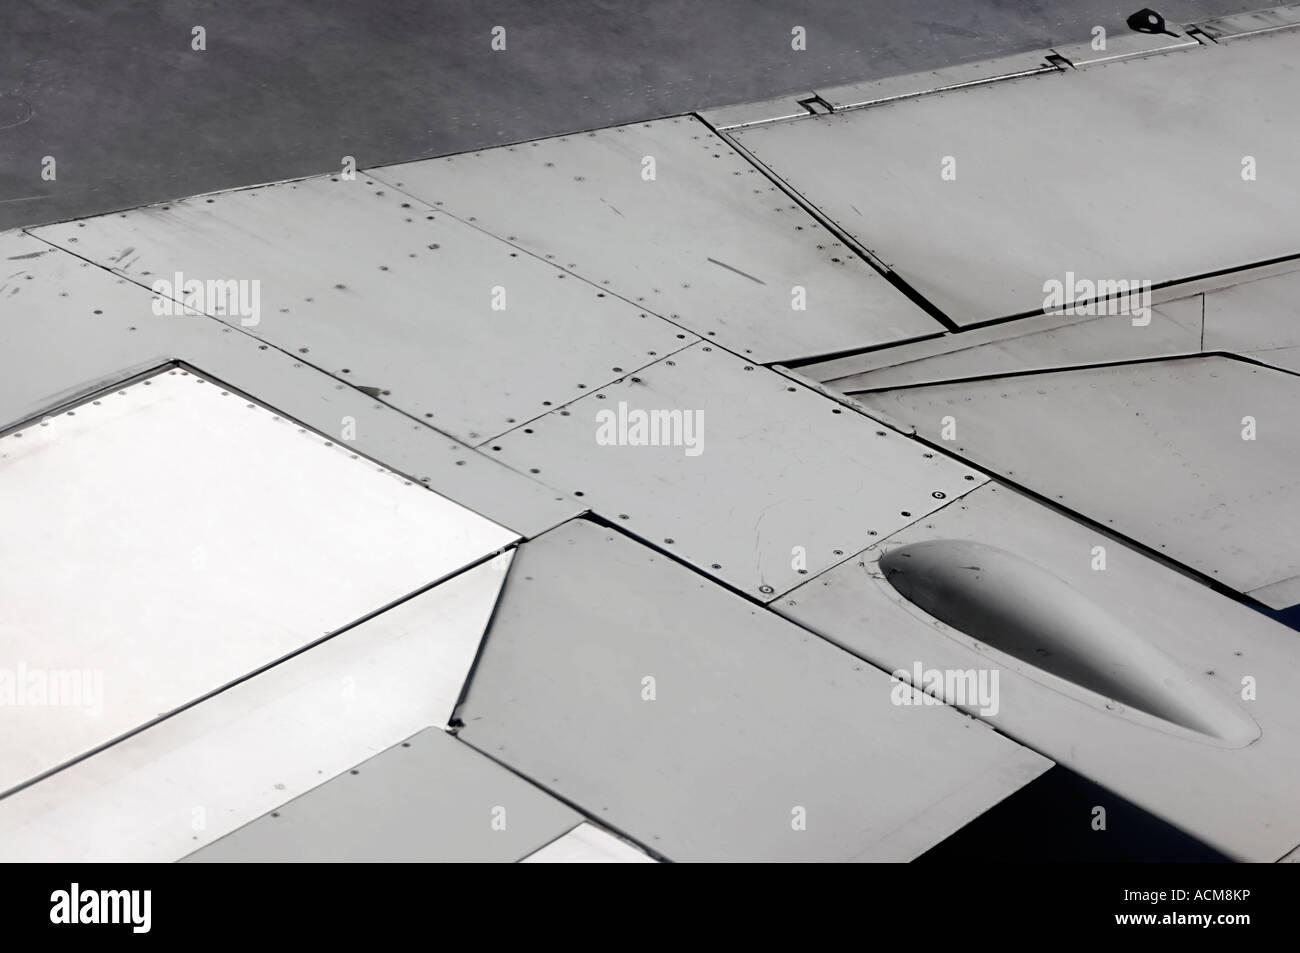 Ala de avión detalles Imagen De Stock